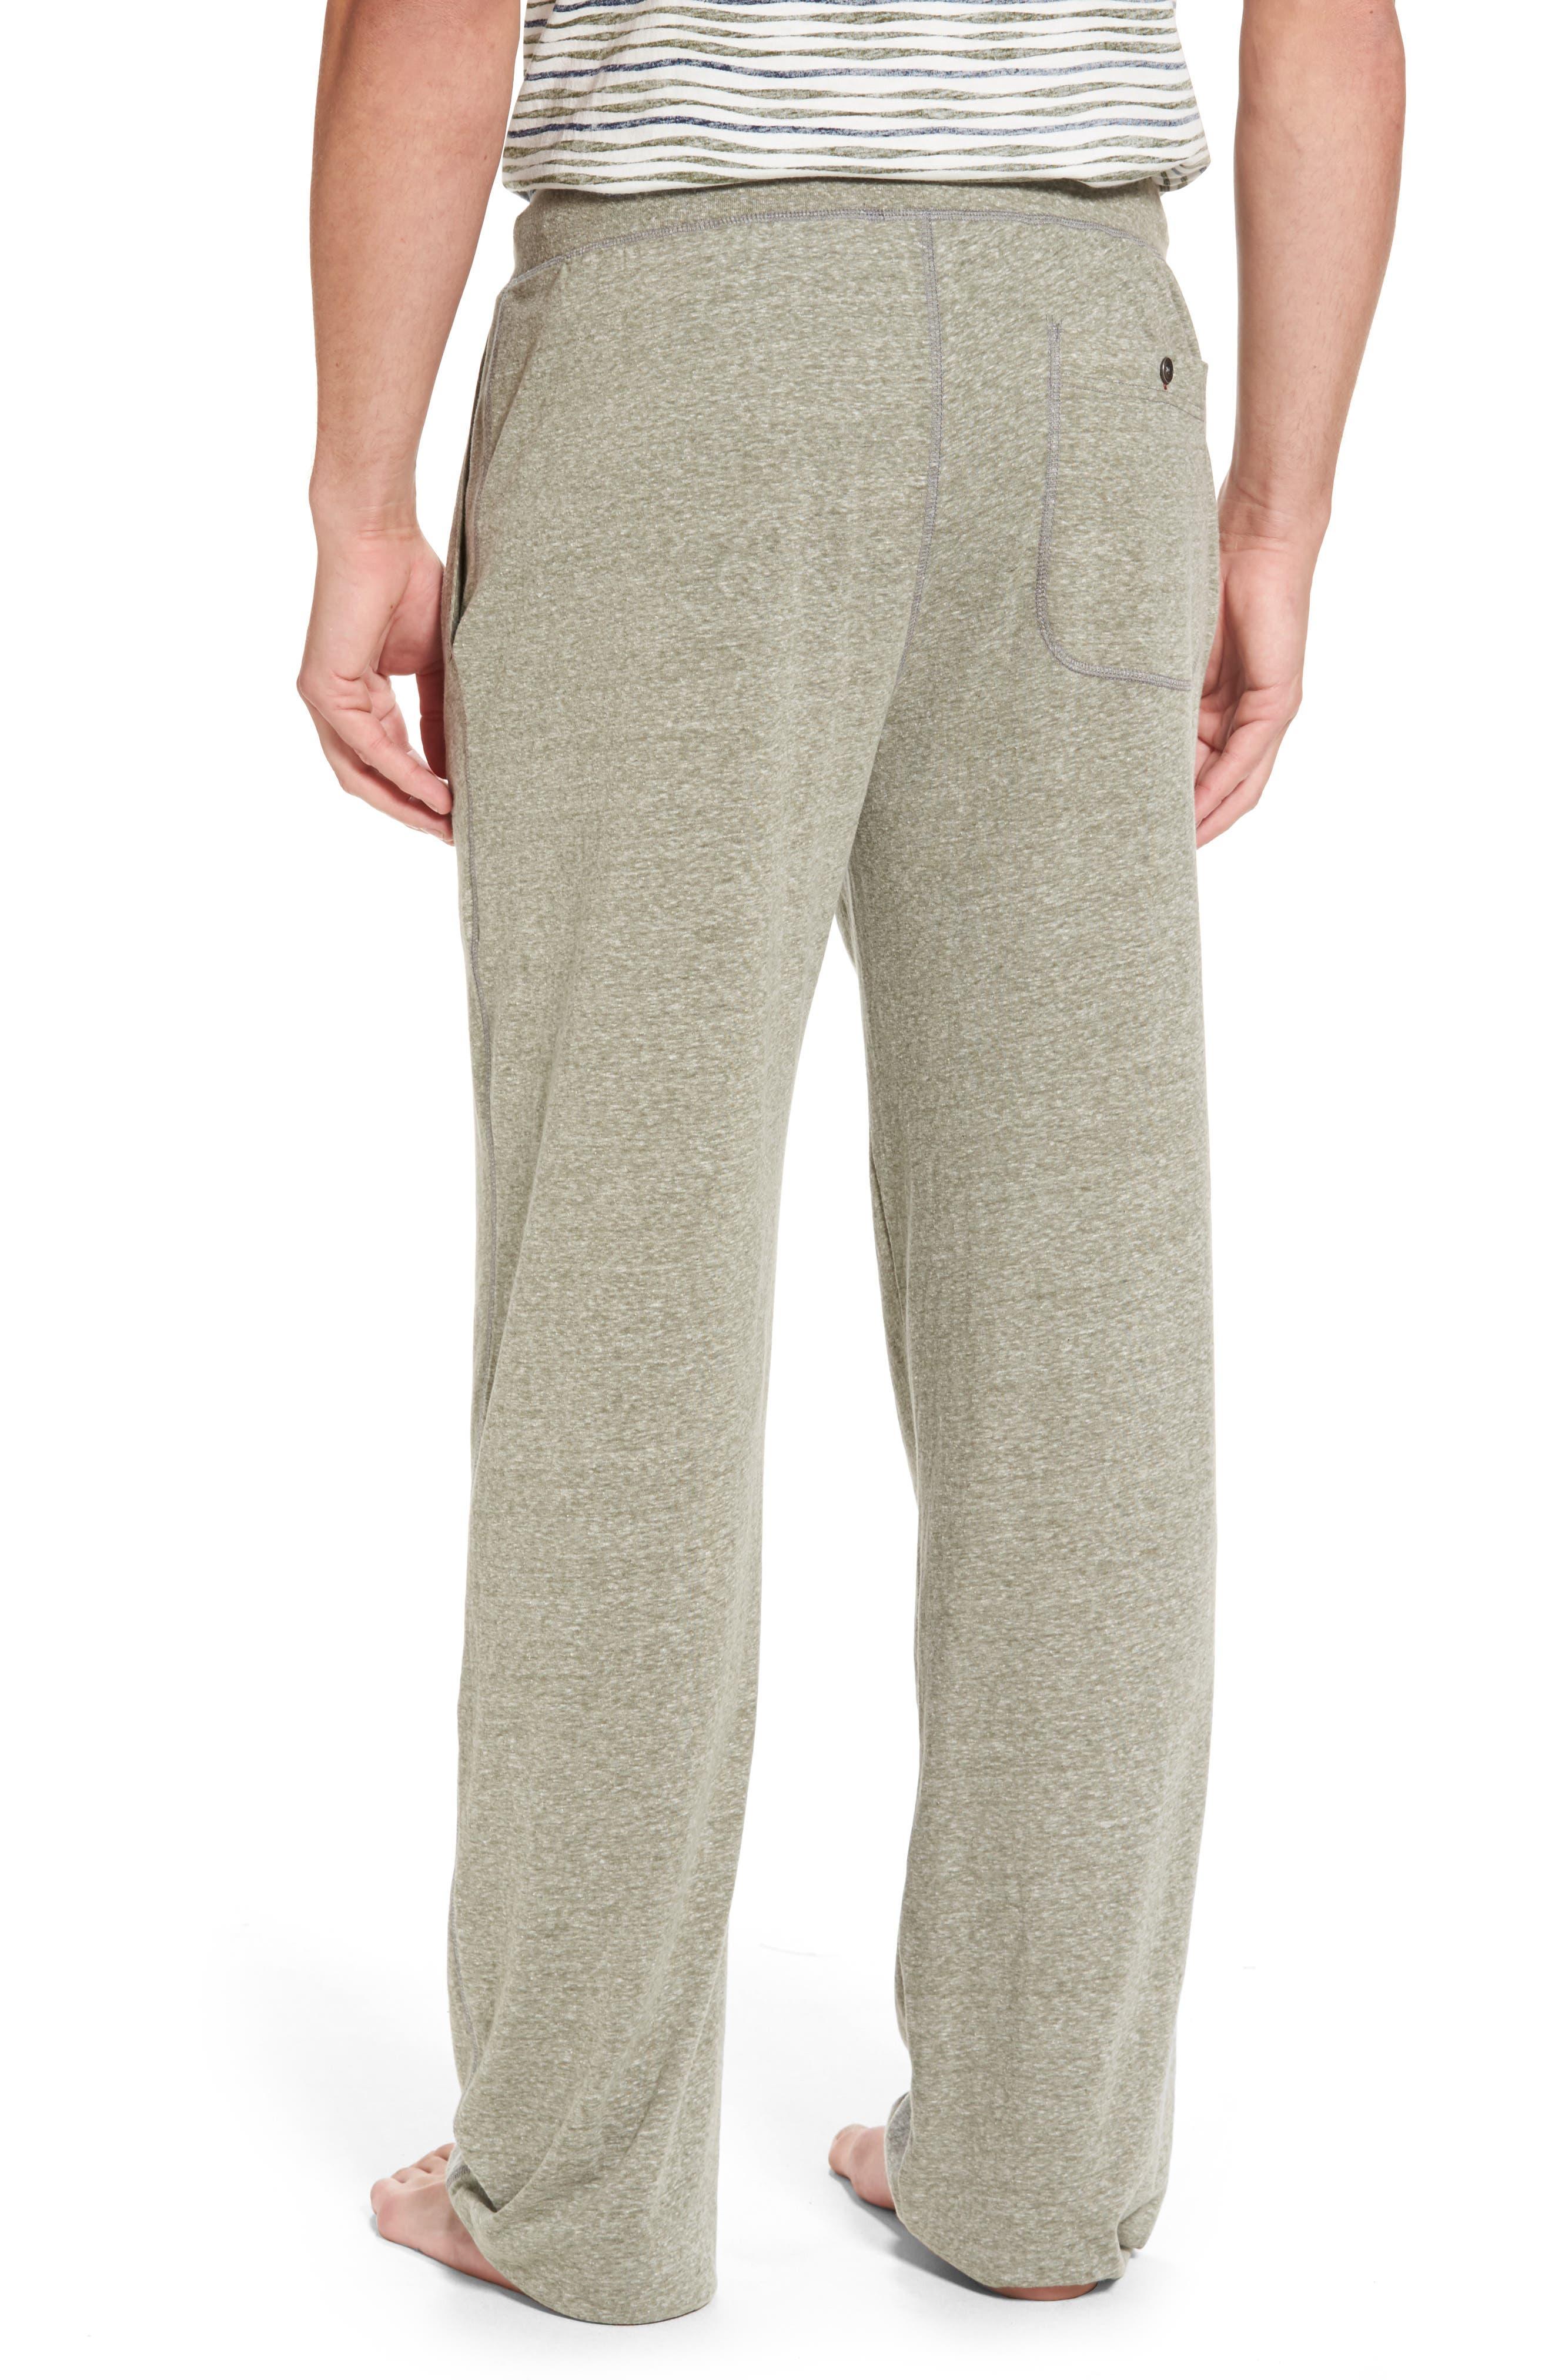 Lounge Pants,                             Alternate thumbnail 2, color,                             301